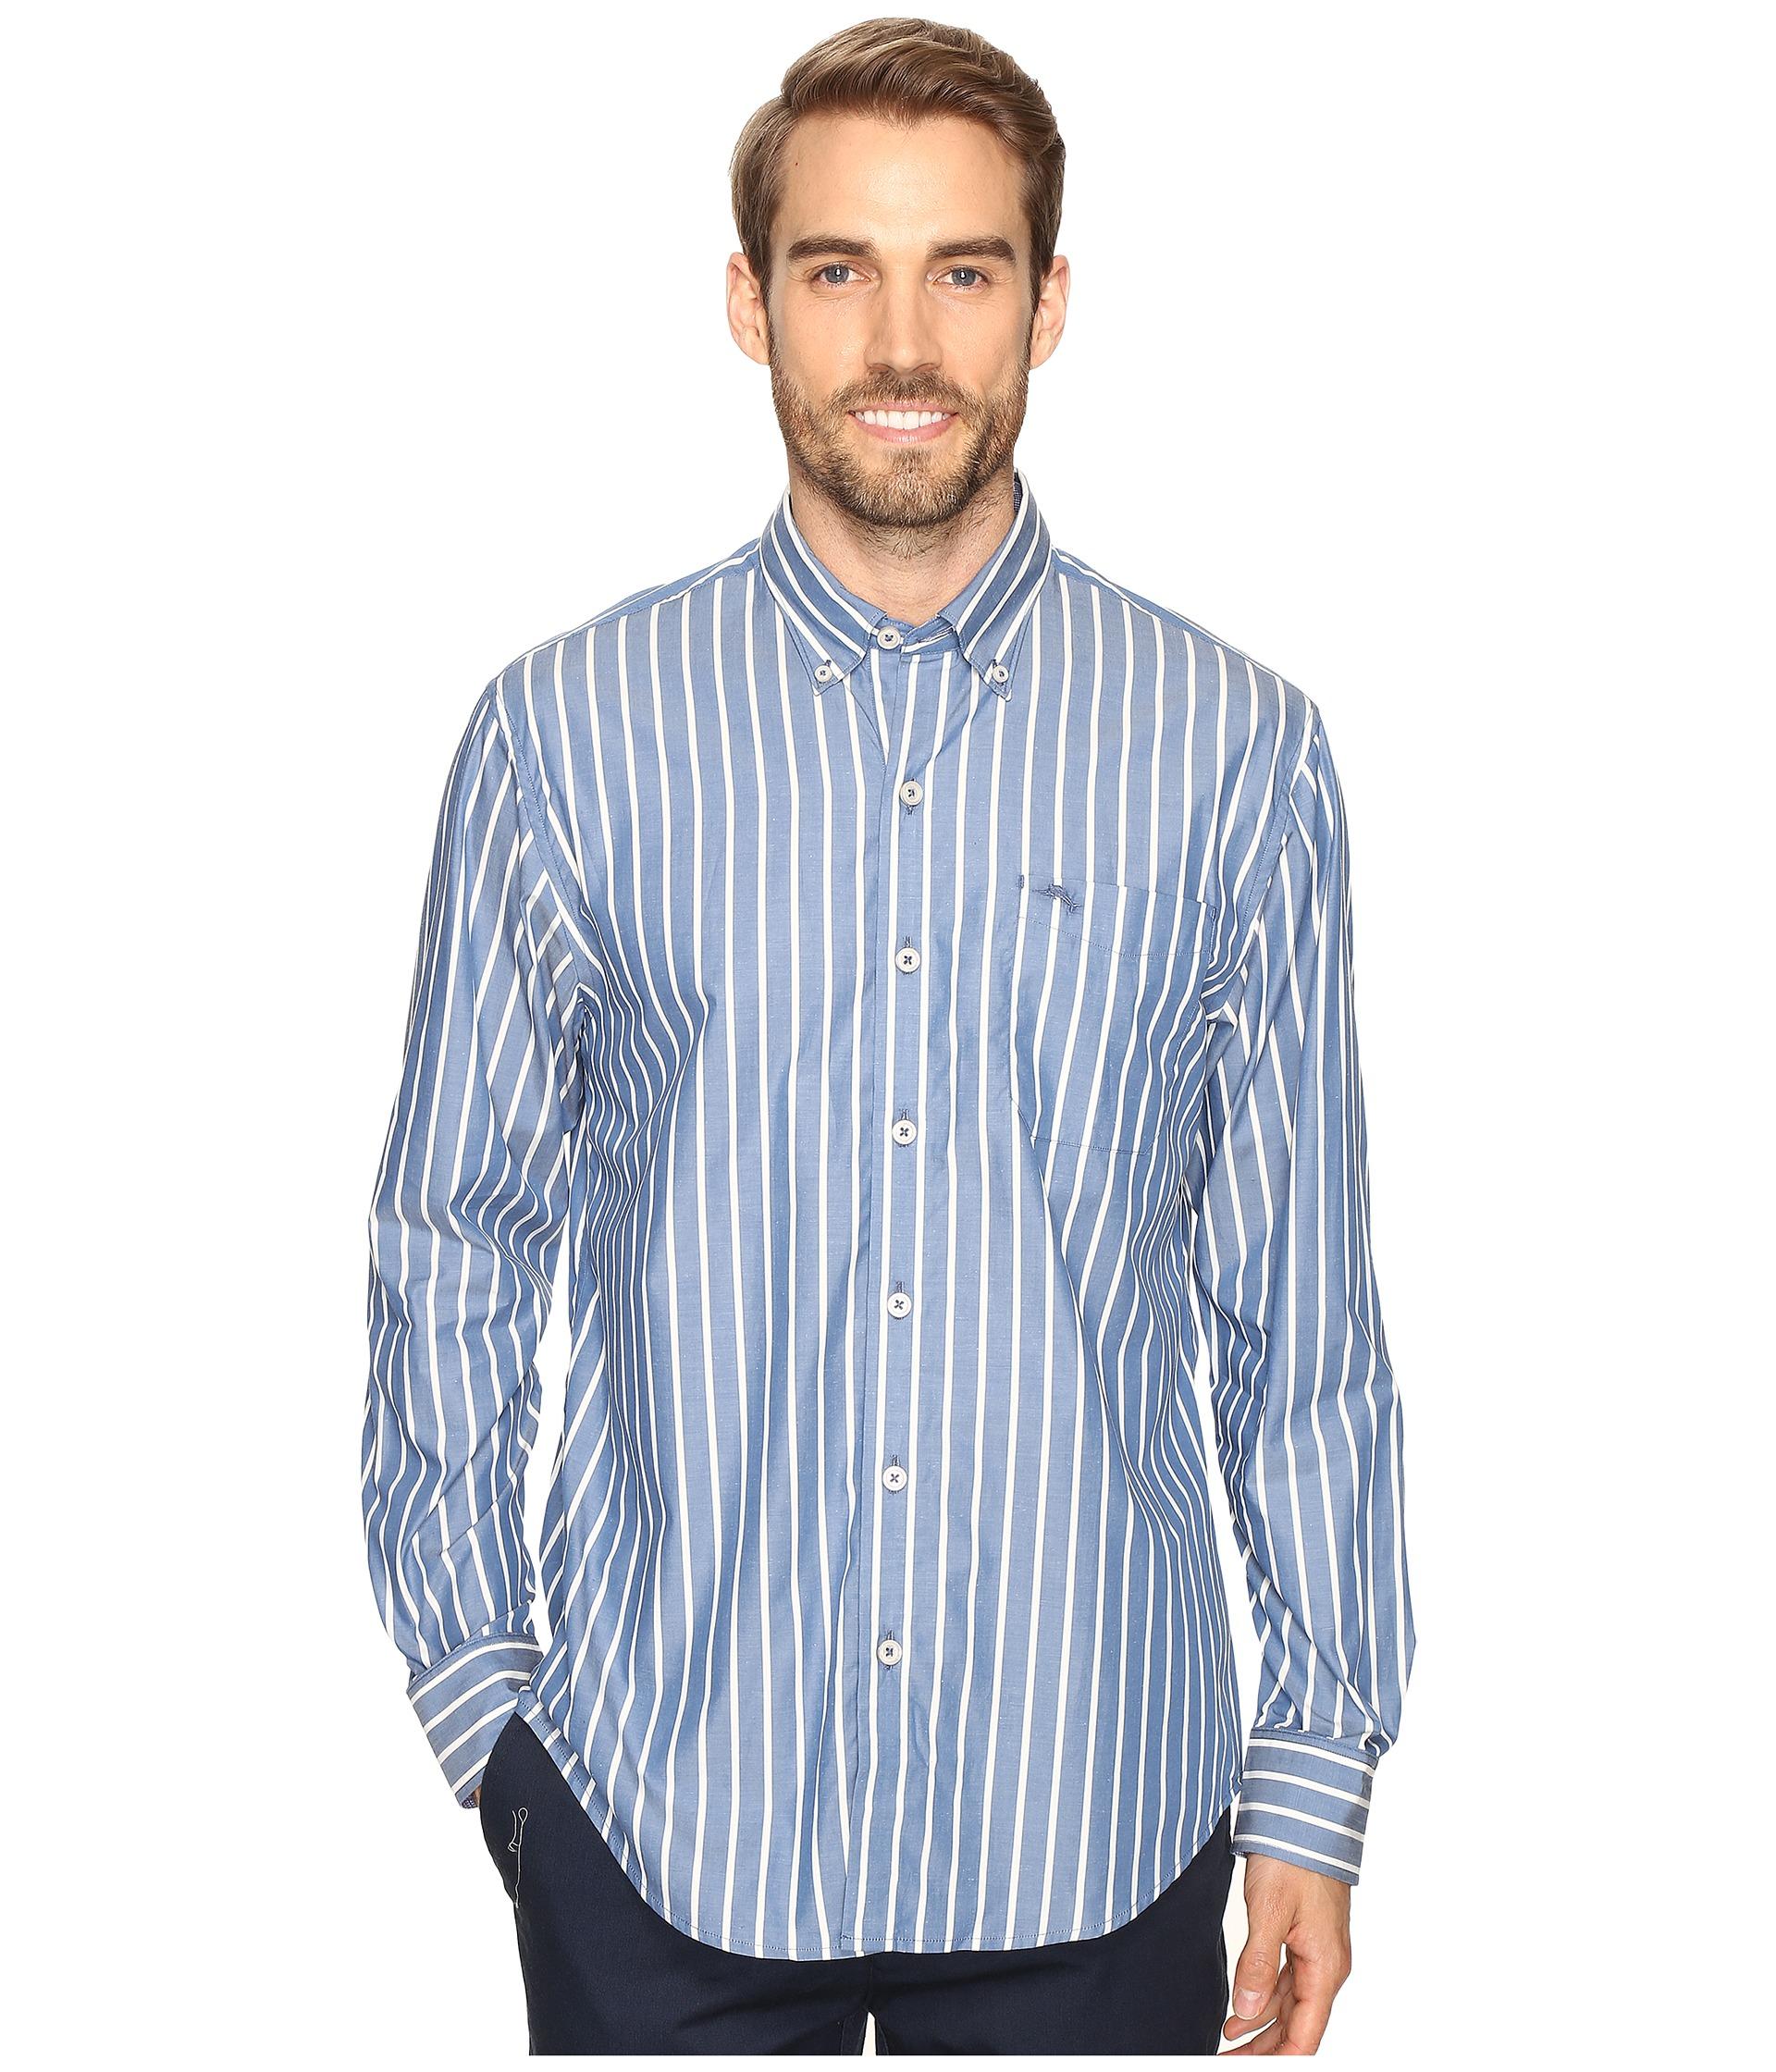 Tommy bahama cabana stripe long sleeve woven shirt at for Tommy bahama long sleeve dress shirts